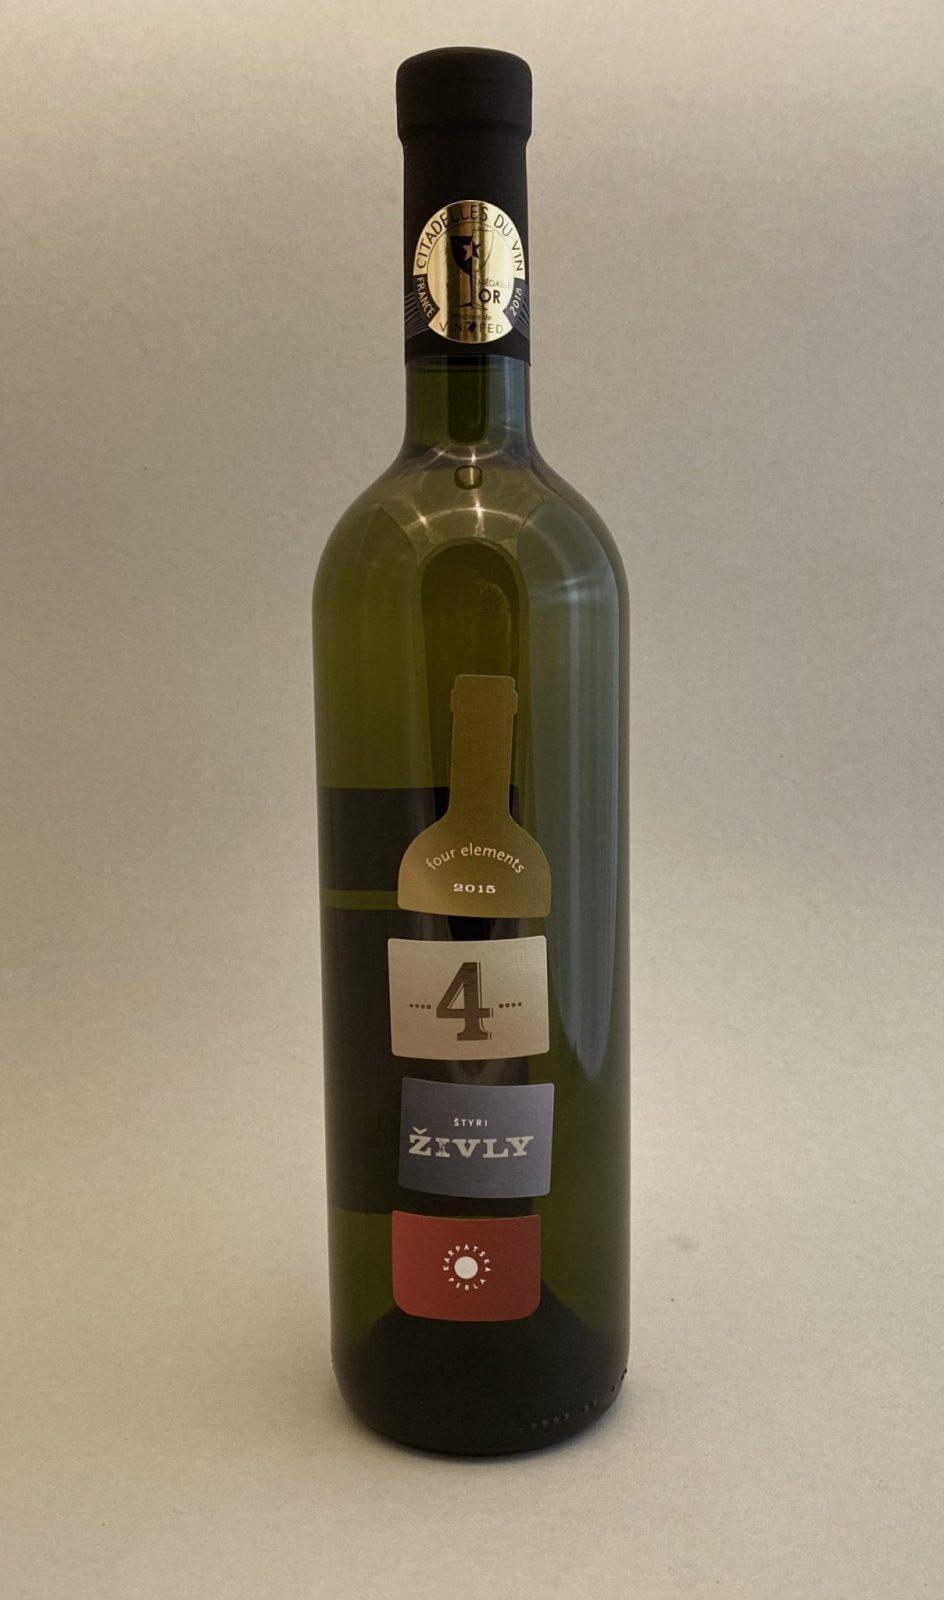 KARPATSKÁ PERLA 4 ªivly, vinotéka v Slnečniciach, slovenské biele víno, Bratislava Petržalka, Sunny Wines